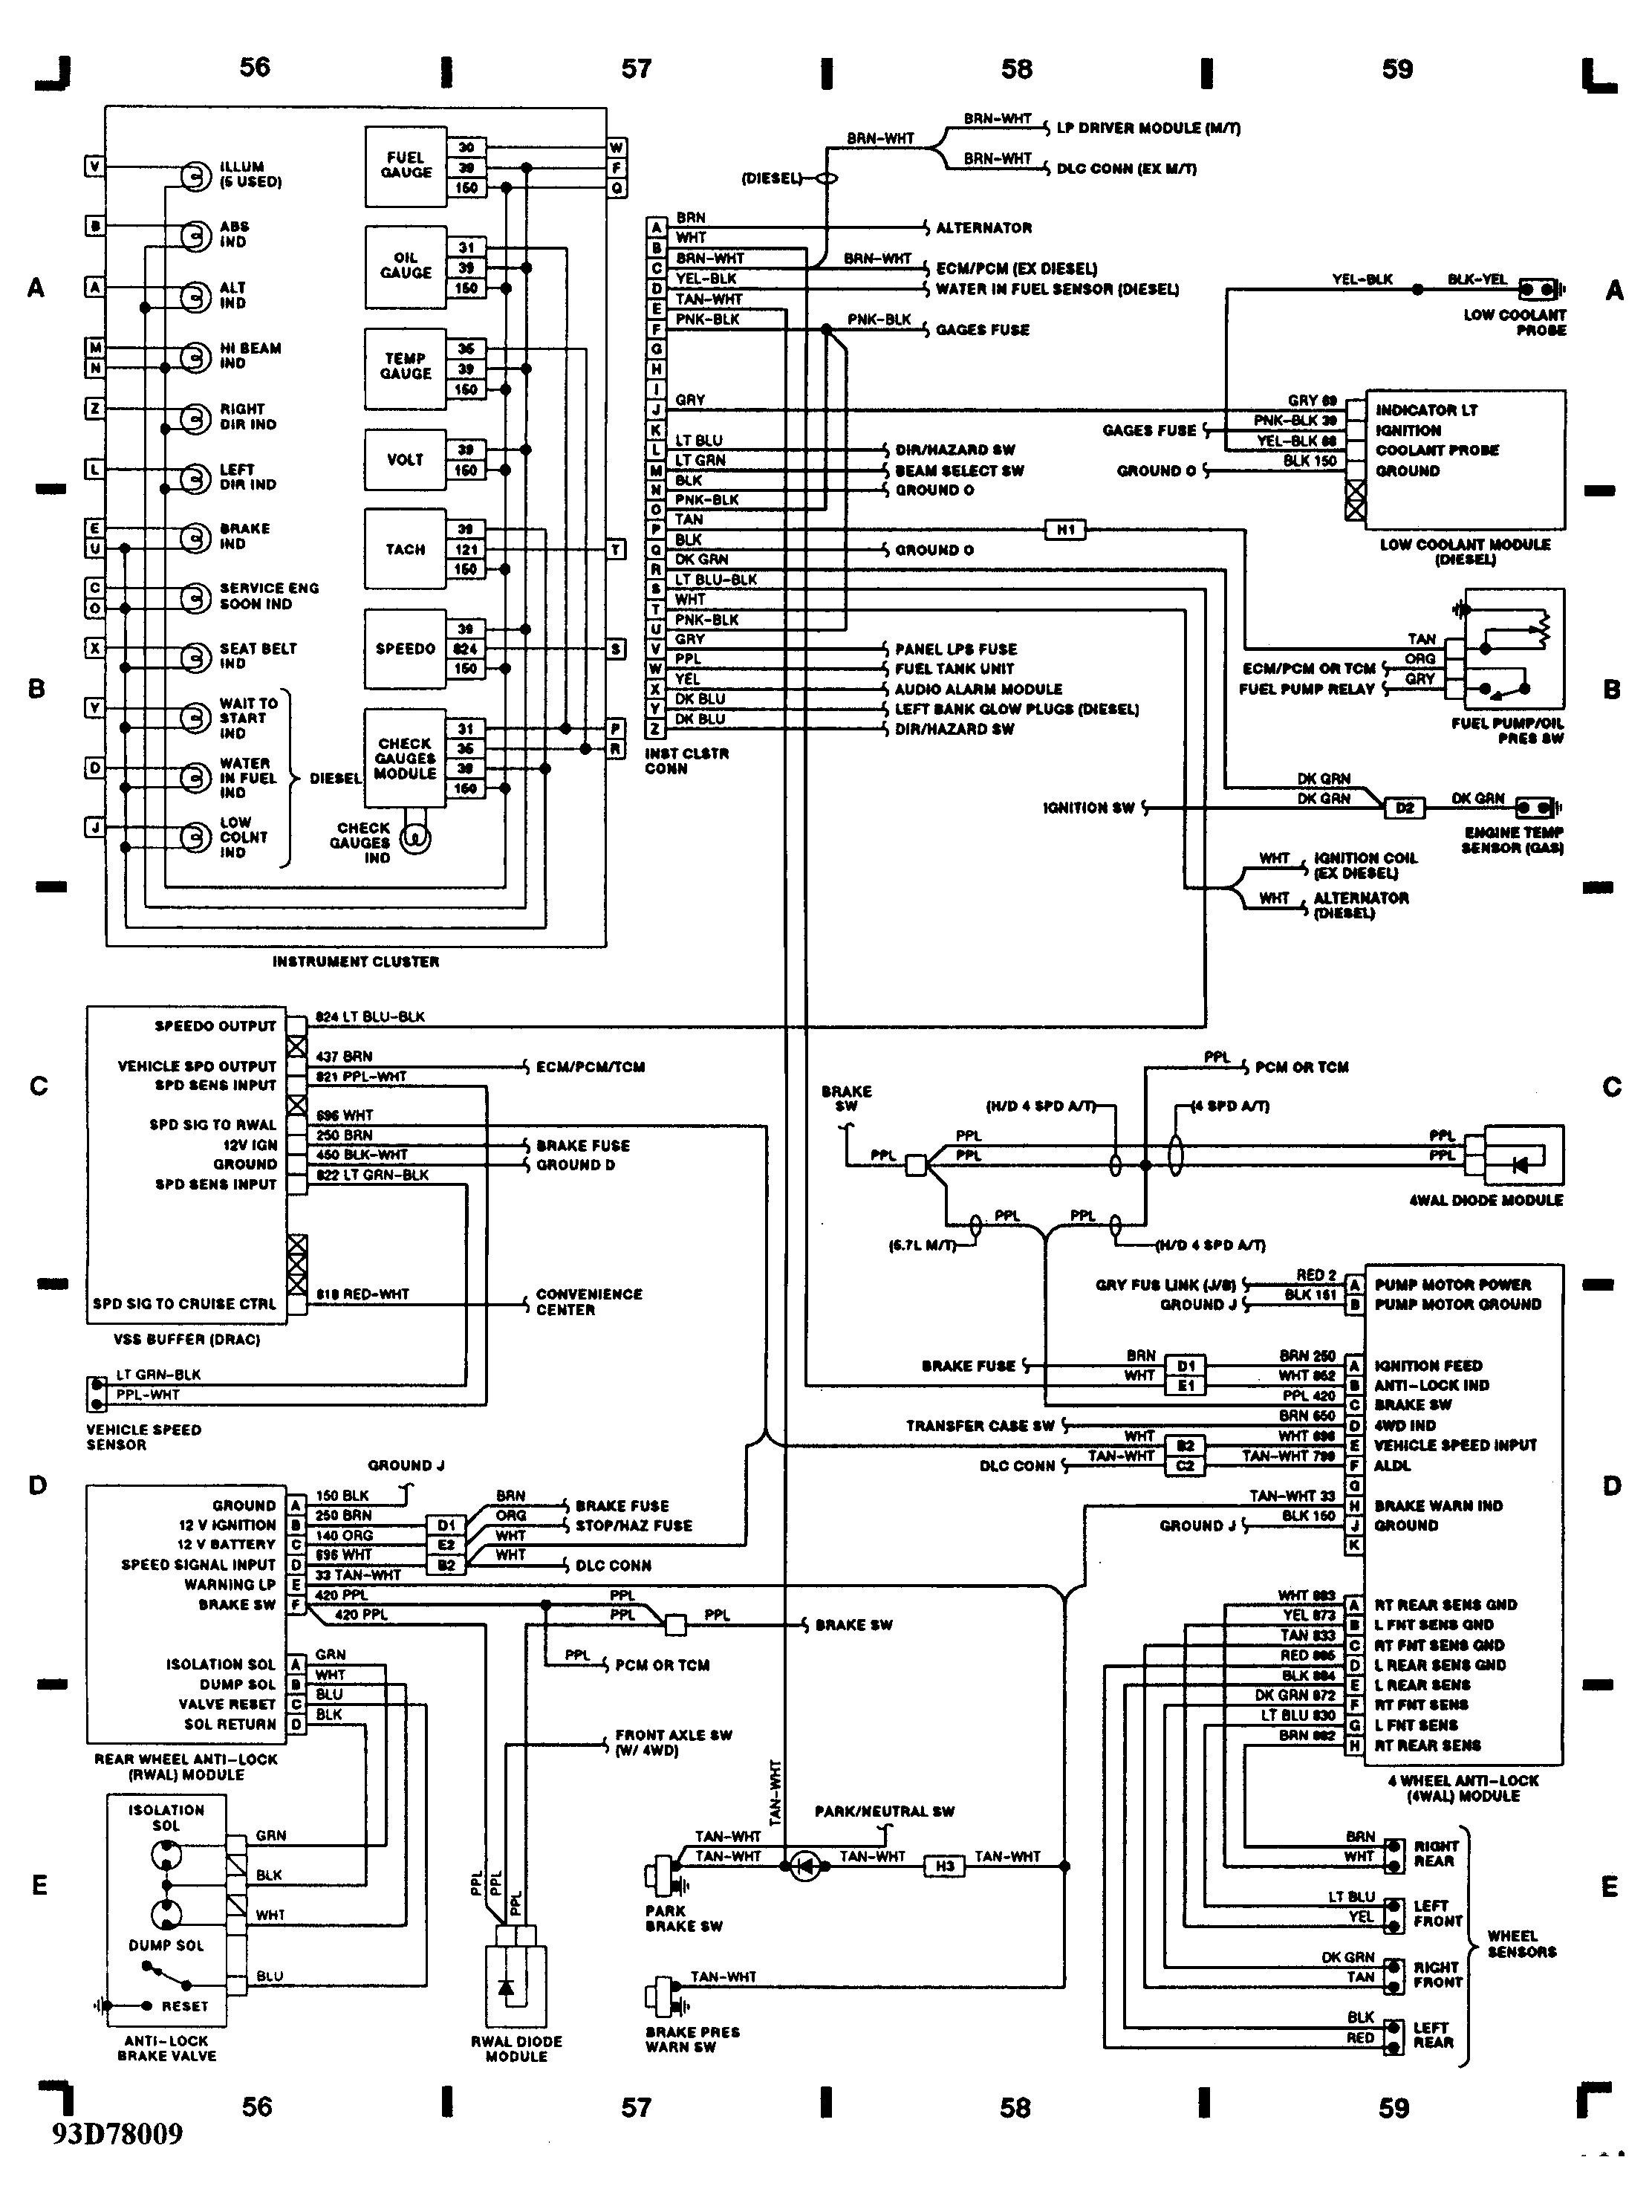 Diagram Database - Just The Best Diagram database Website   Wiring Diagram For 2000 Chevrolet S 10      lindiagram.hosteria87.it